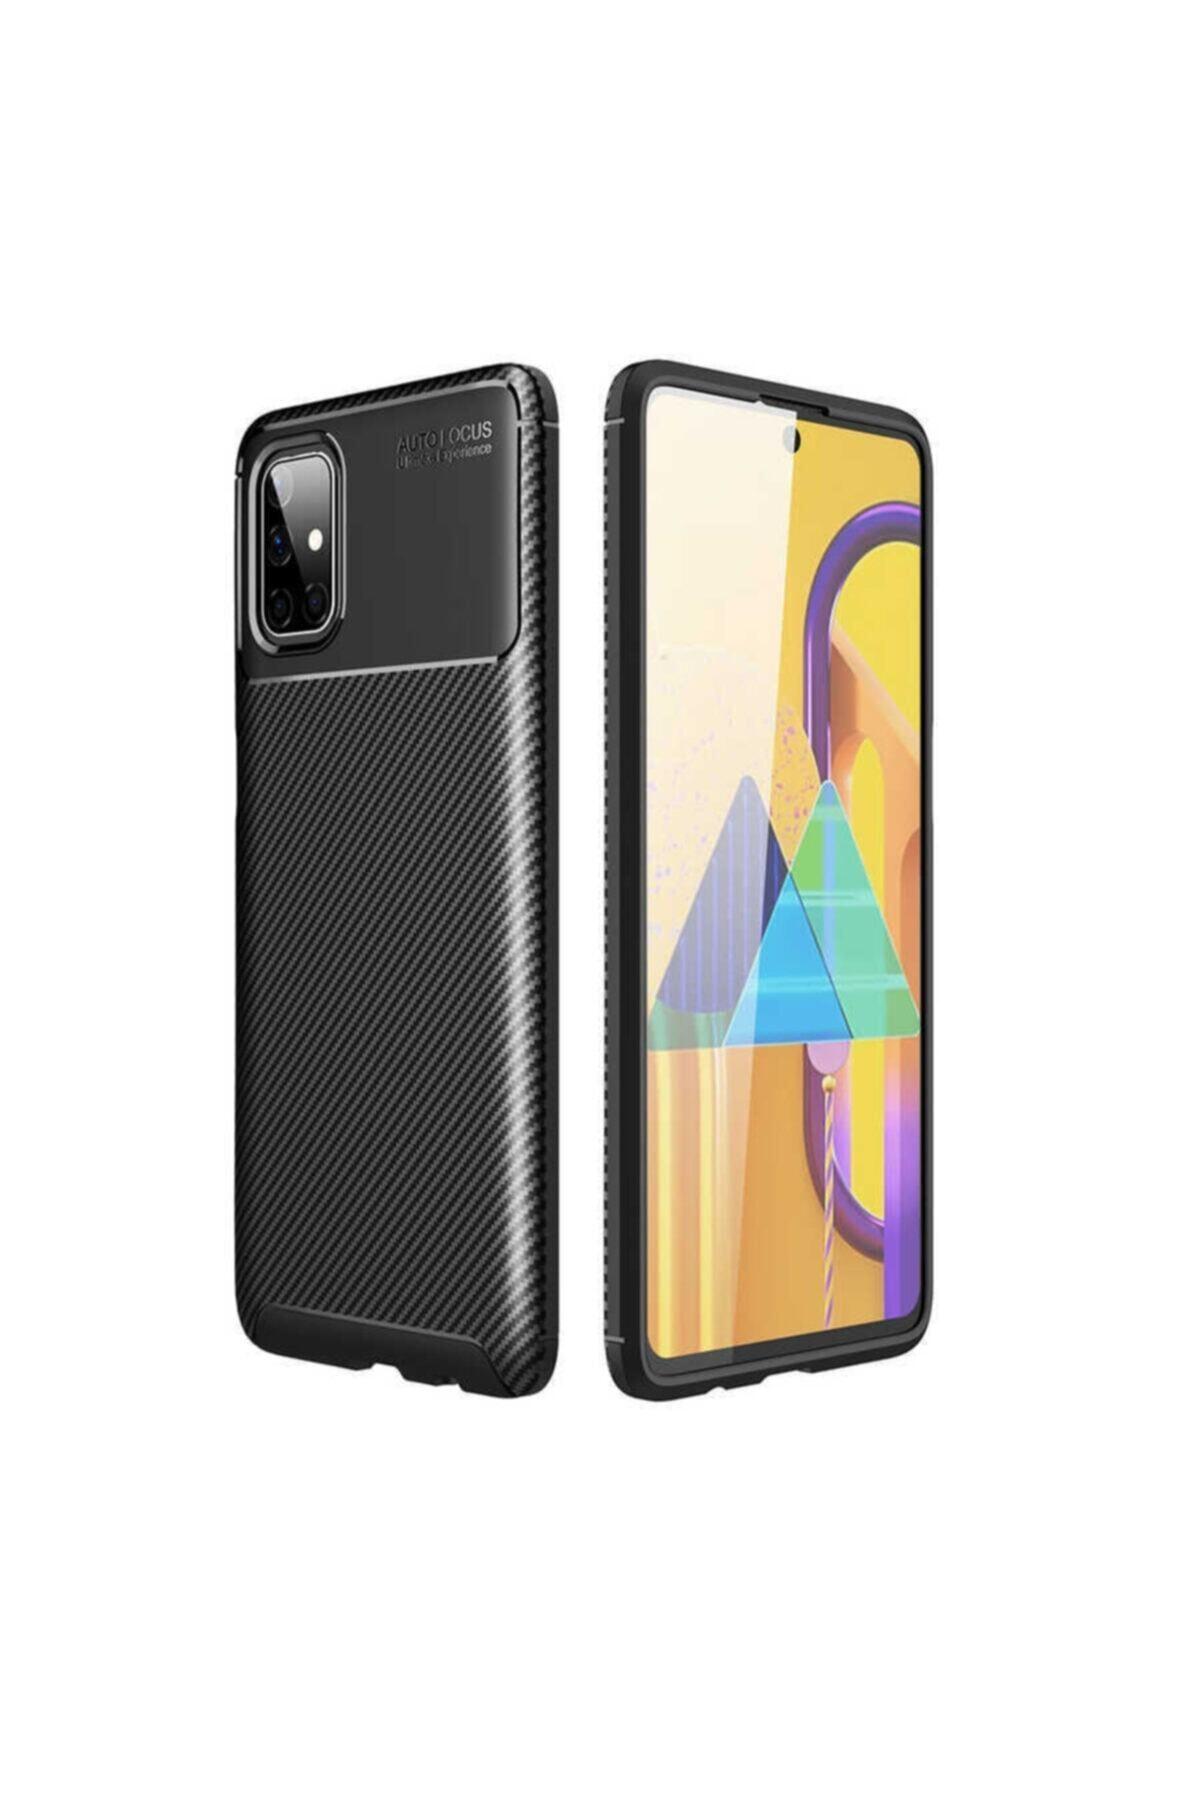 ankacep Samsung Galaxy M51 Kılıf Negro Karbon Tasarımlı Silikon Kapak 1